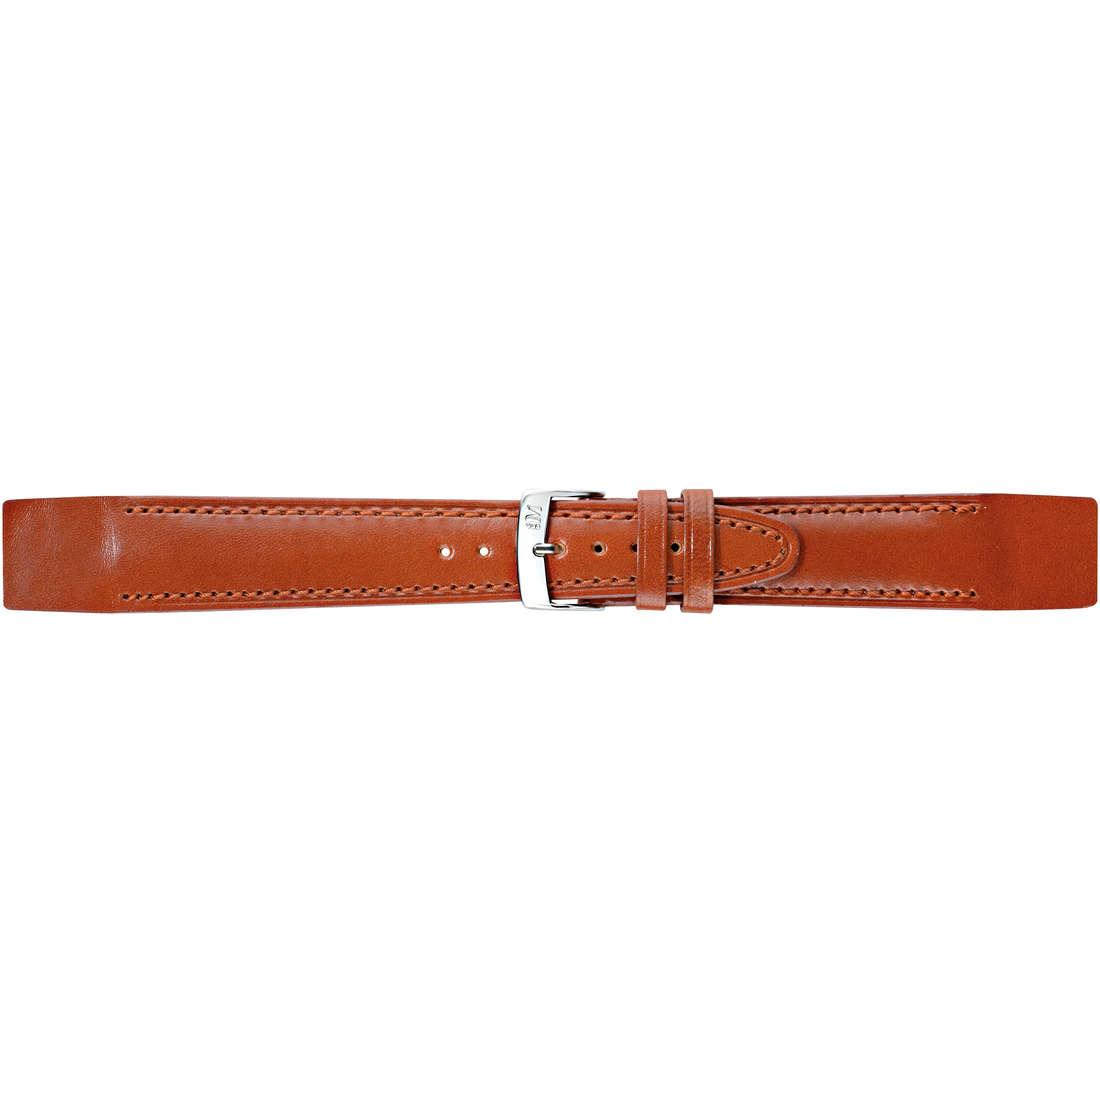 montre bande de montres homme Morellato I Lunghi A01U2663403041CR16